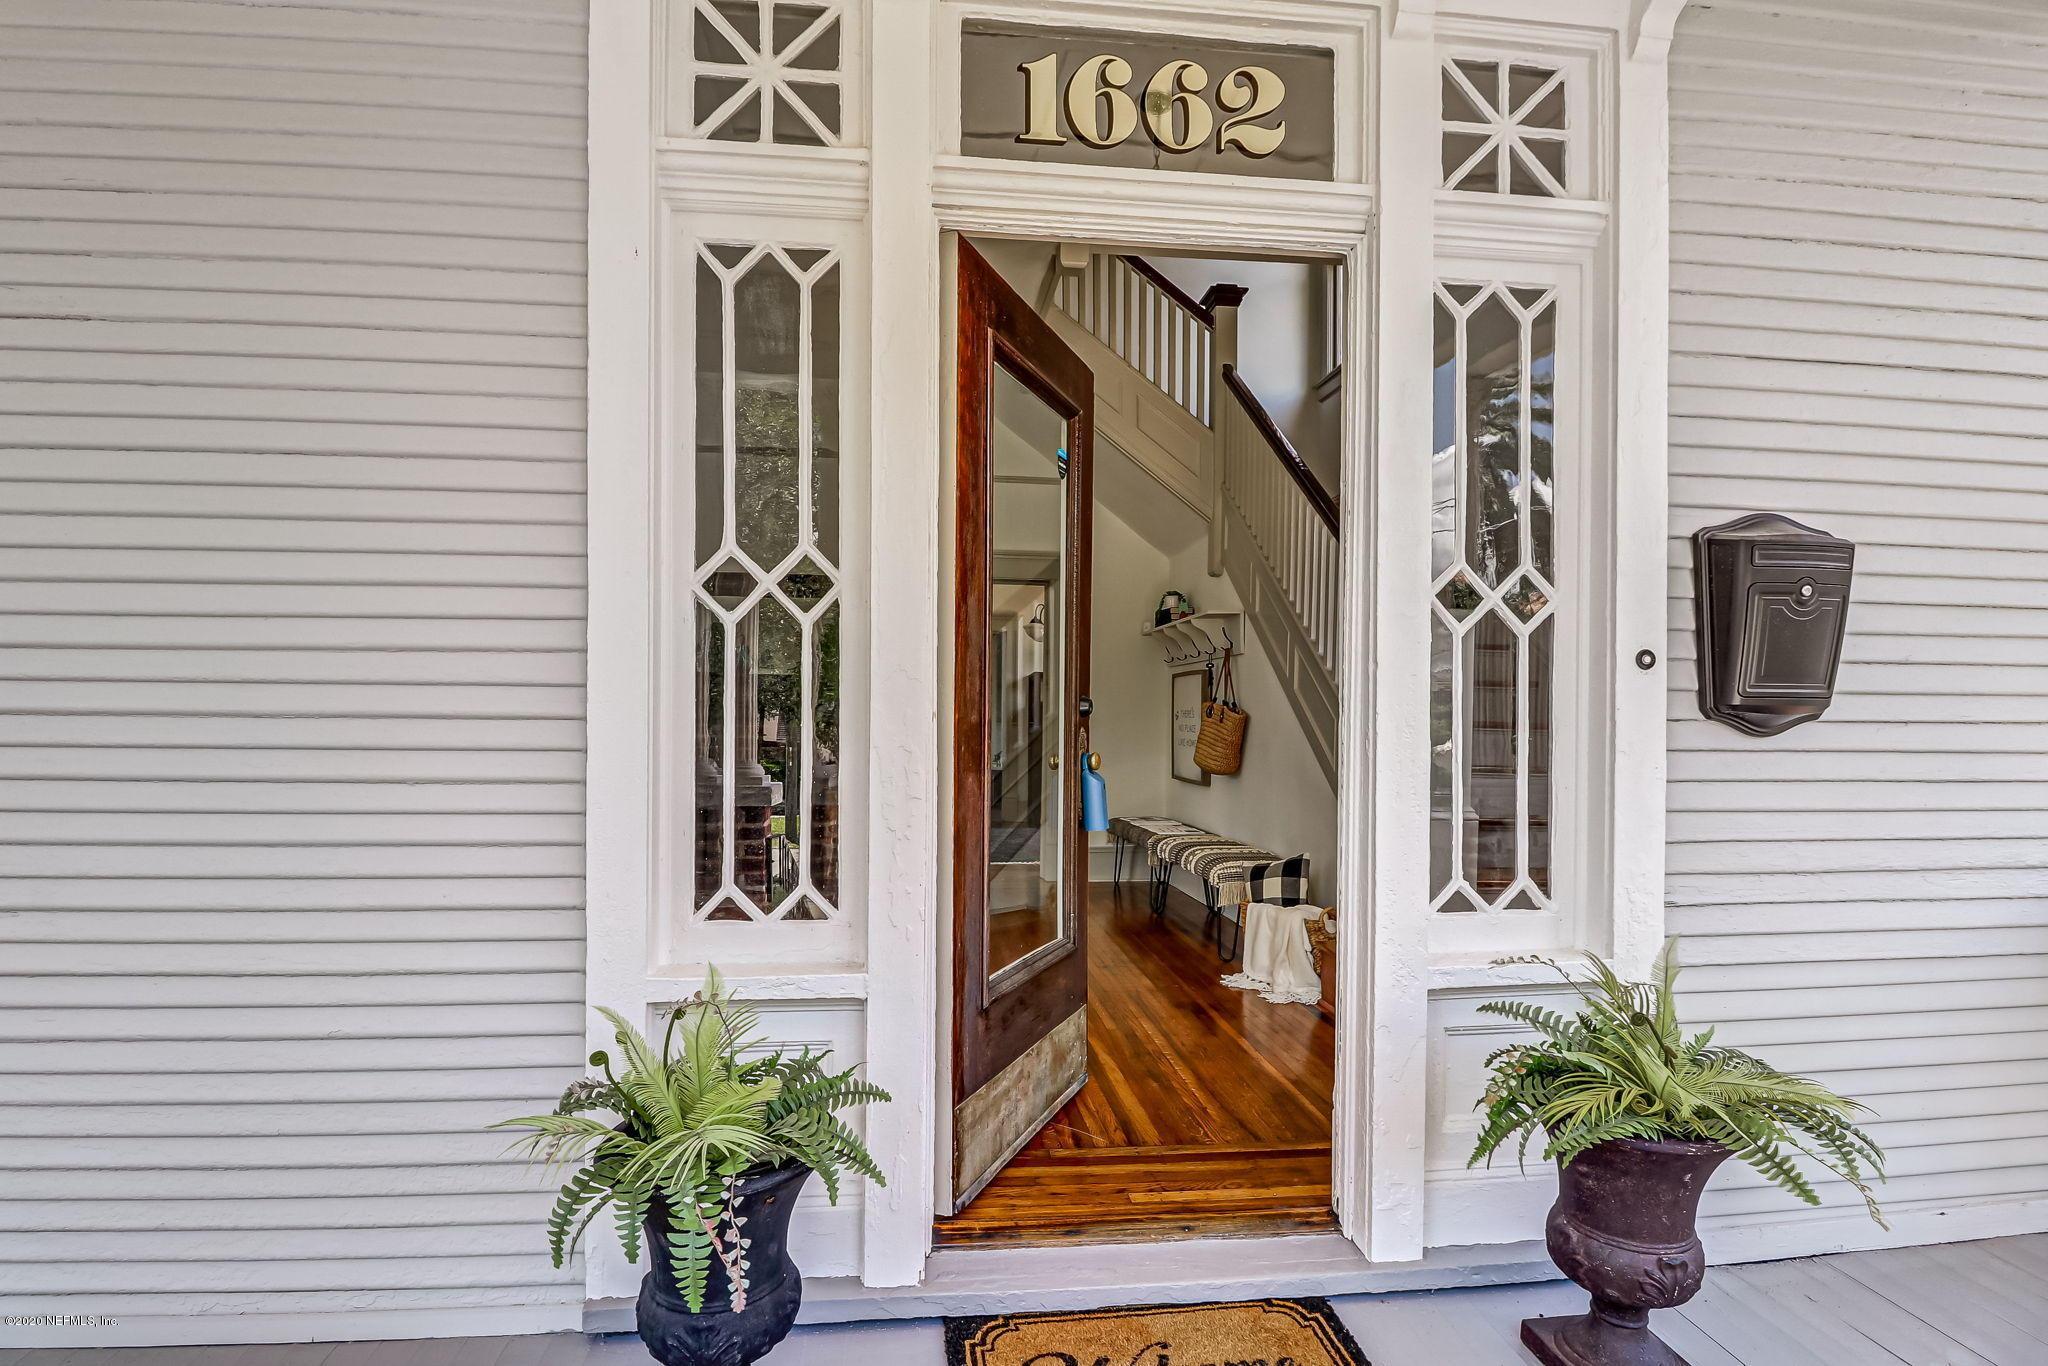 1662 OSCEOLA, JACKSONVILLE, FLORIDA 32204, 3 Bedrooms Bedrooms, ,3 BathroomsBathrooms,Residential,For sale,OSCEOLA,1057990